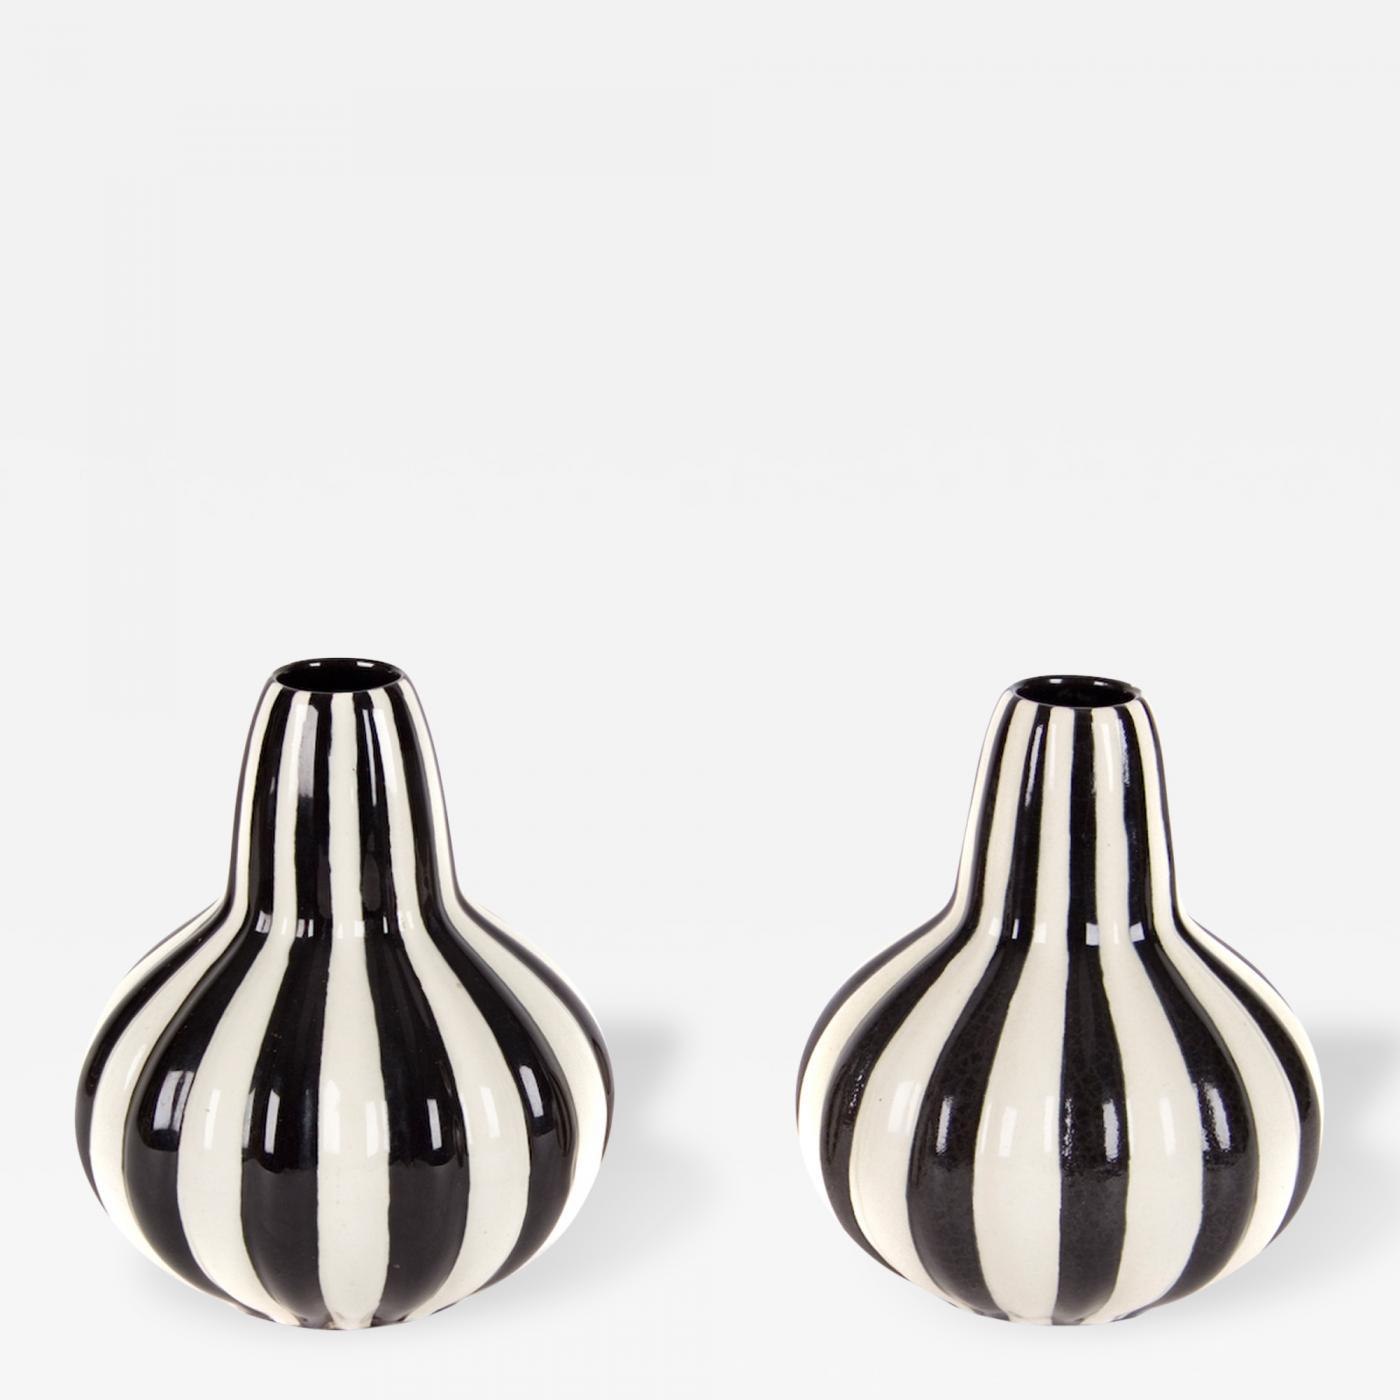 Velten vordamm pair of german art deco period ceramic for Art deco era dates